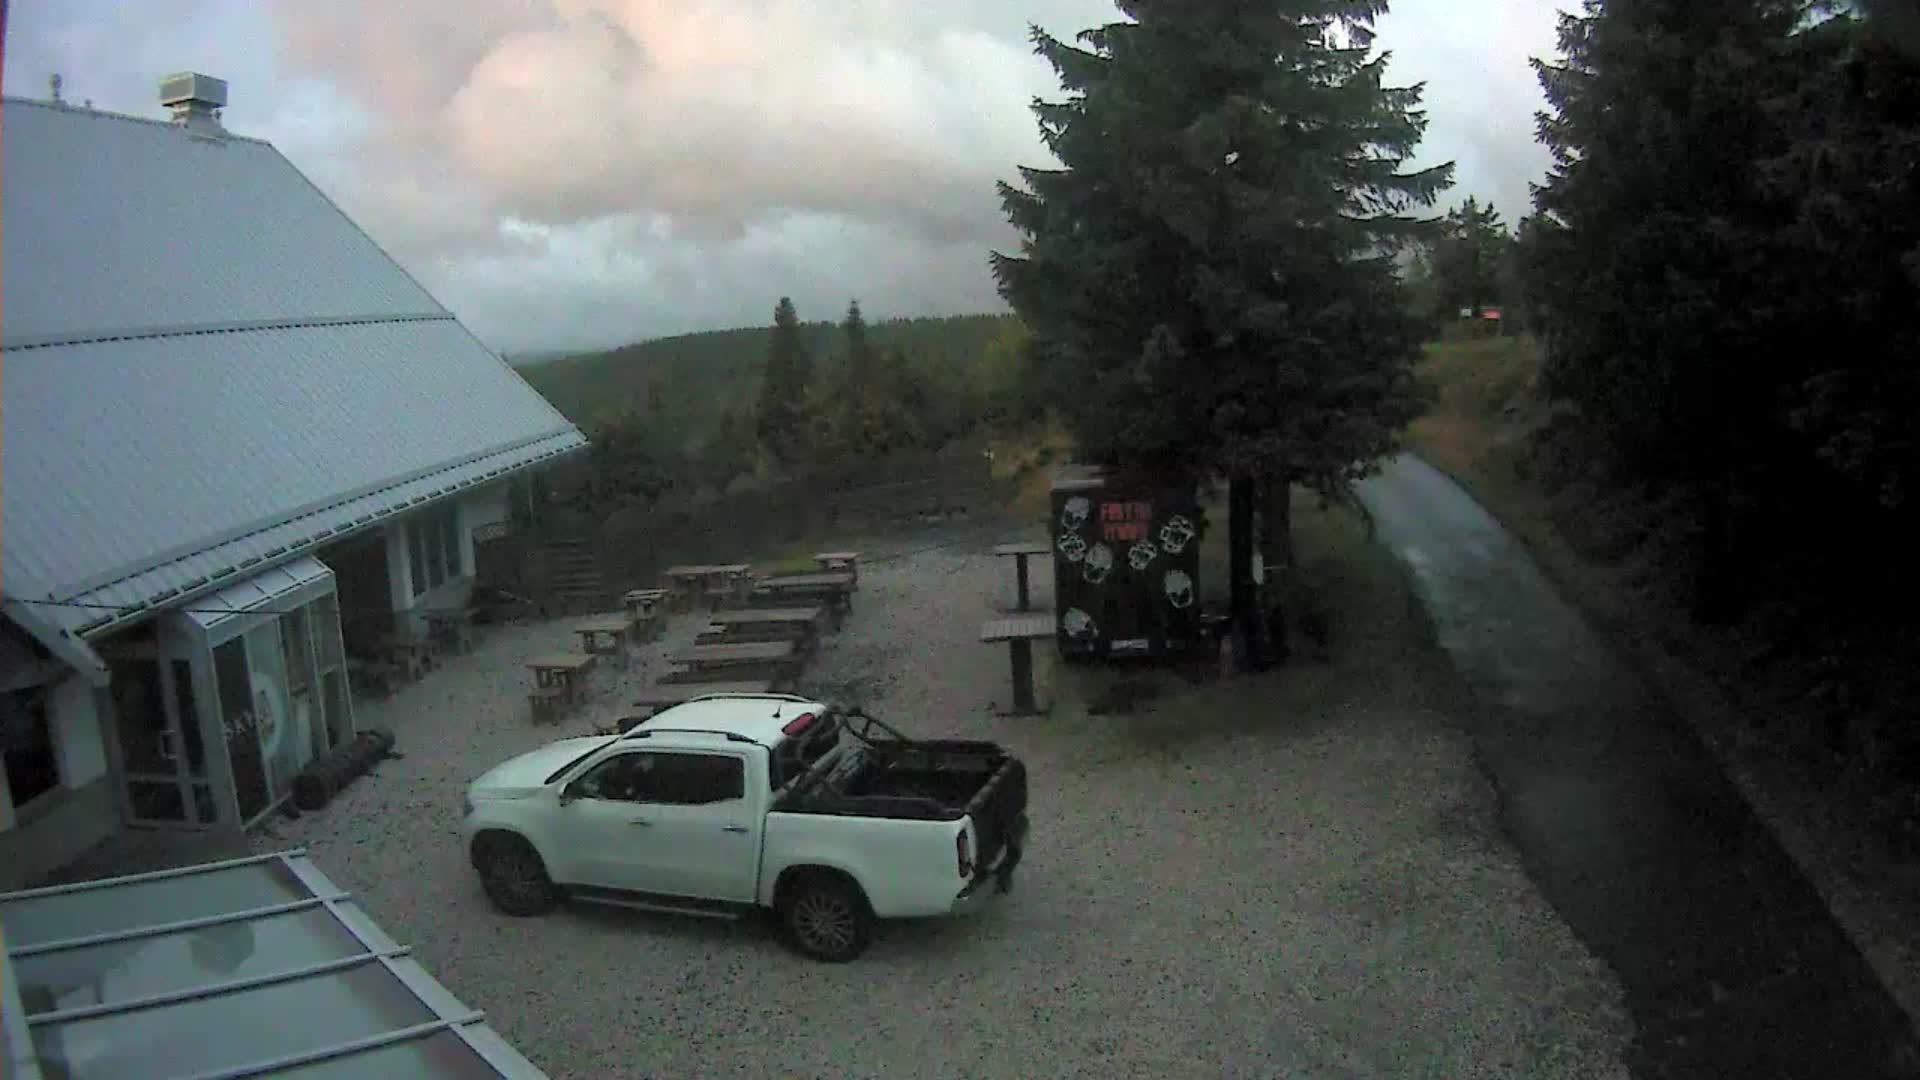 Webcam Skigebiet Swieradow Zdroj cam 5 - Isergebirge